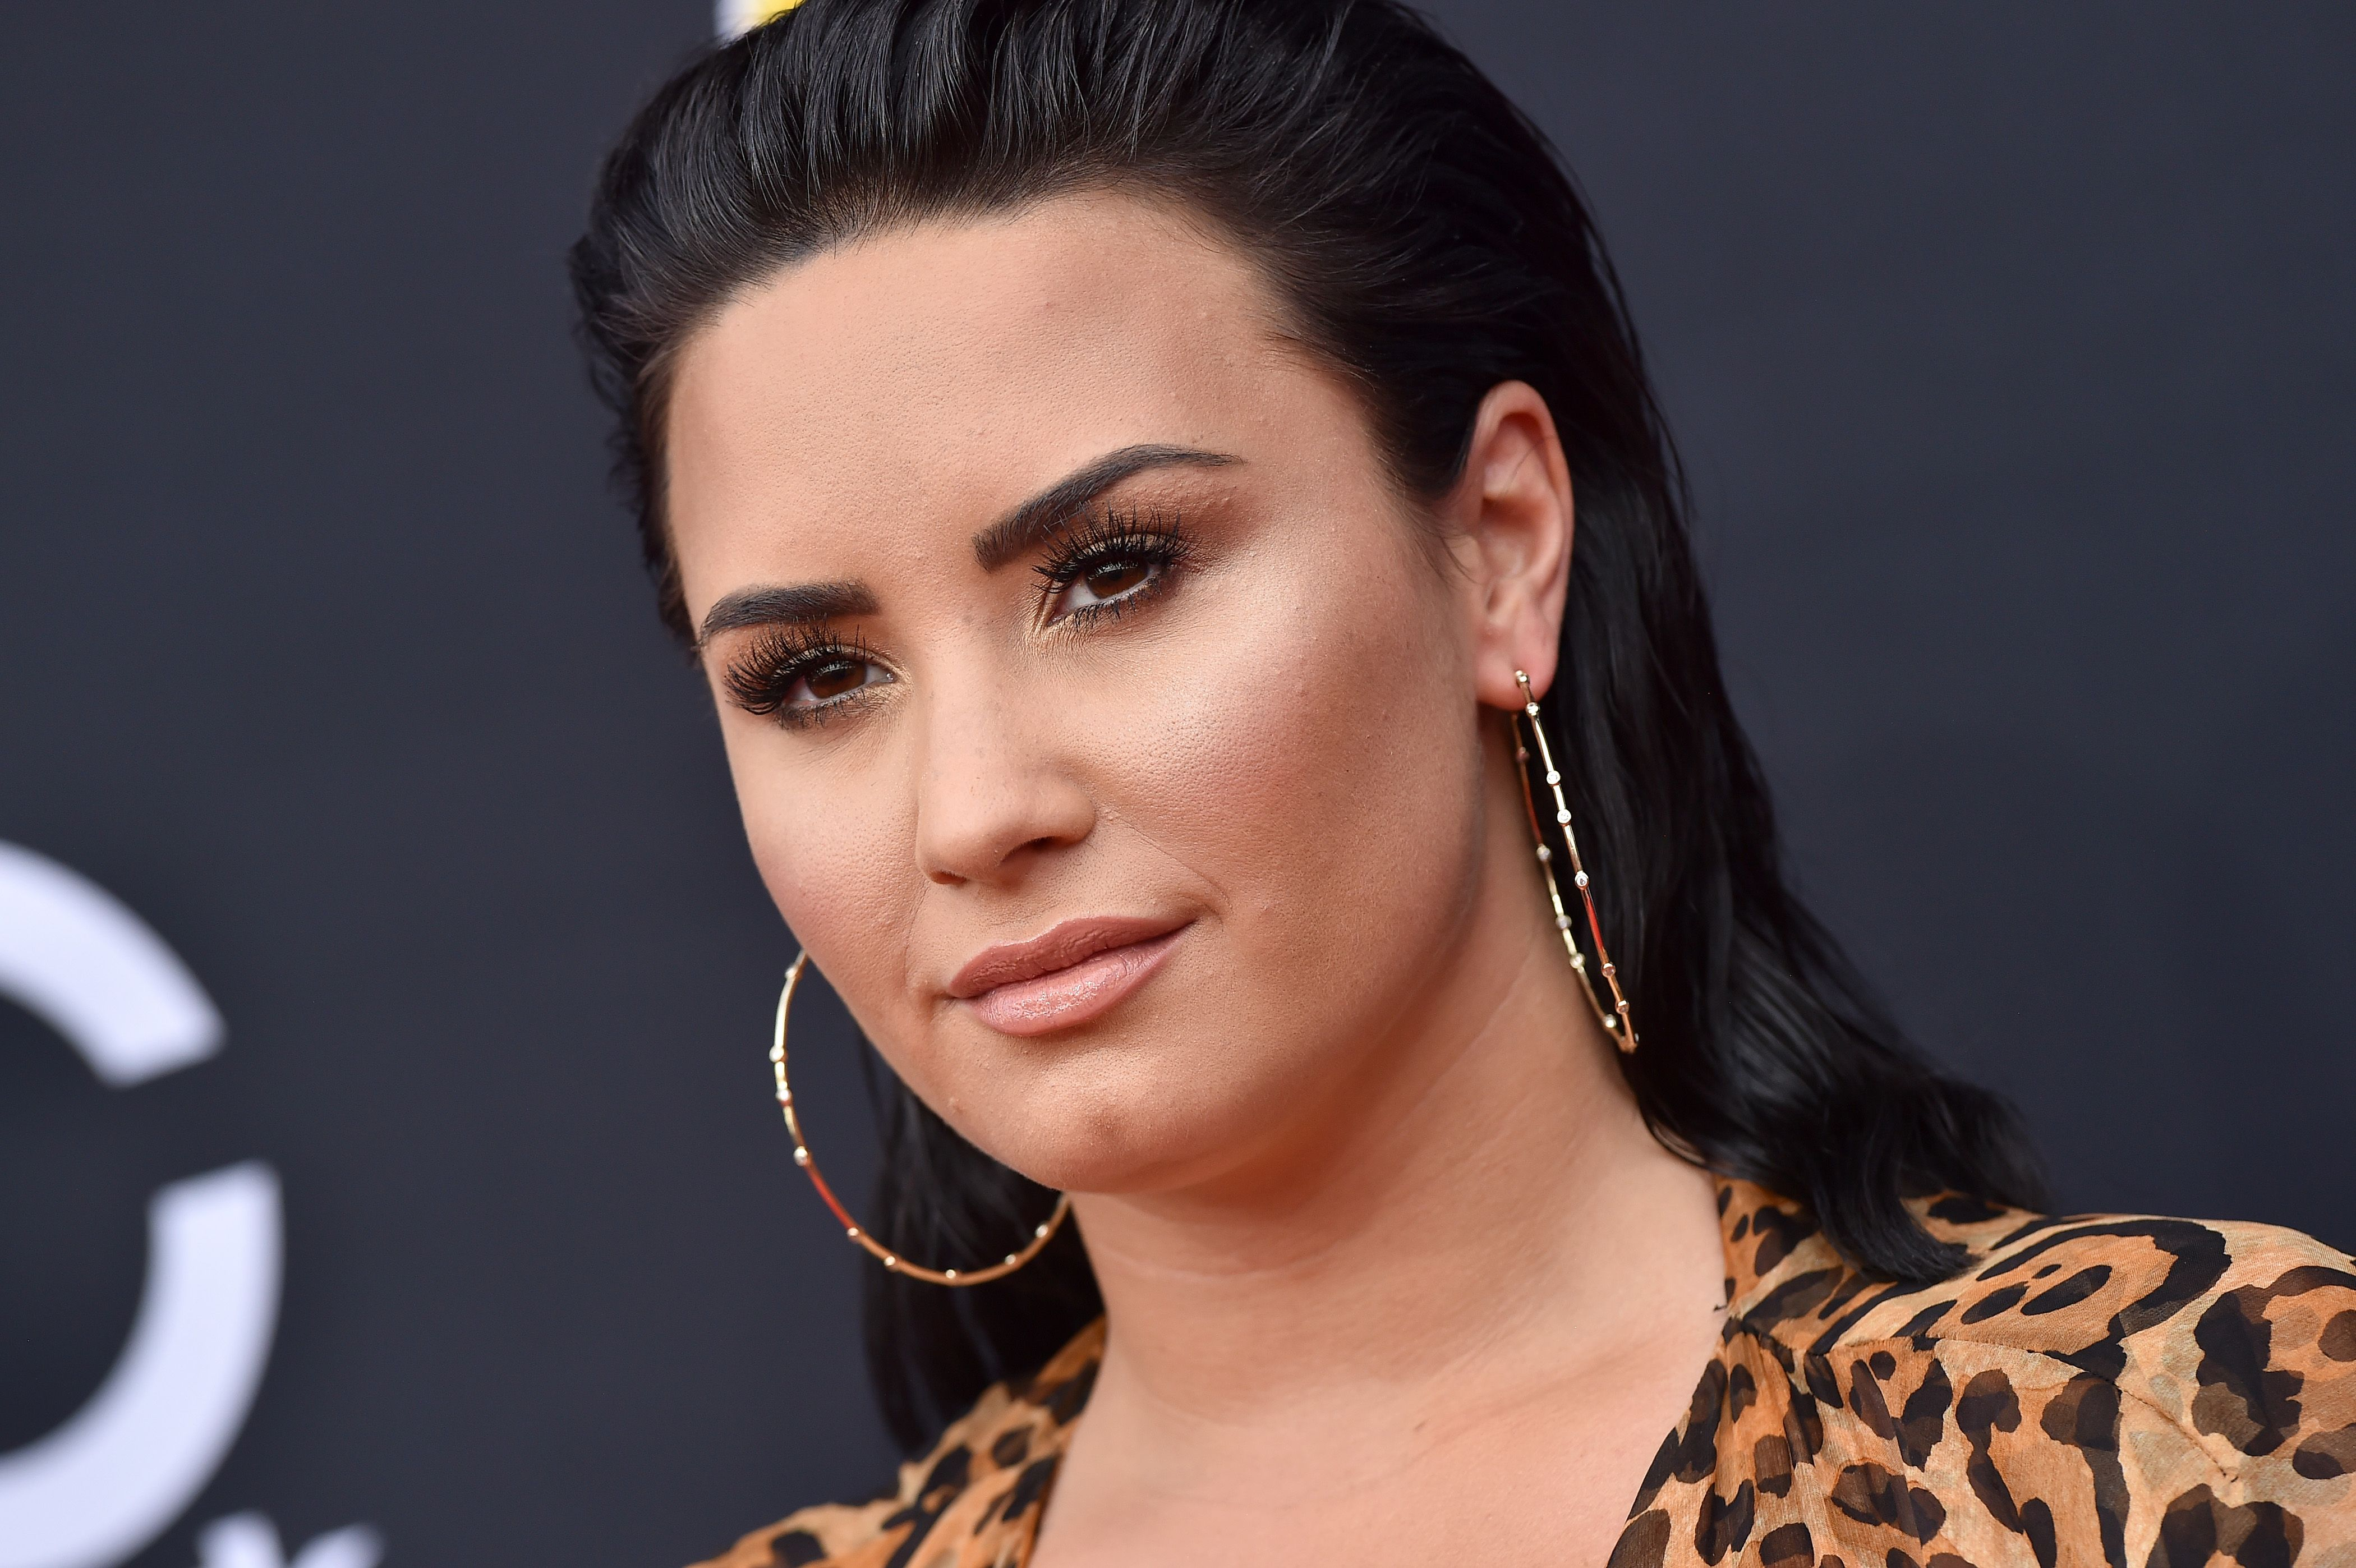 Celebrites Demi Lovato naked (61 photos), Topless, Fappening, Selfie, cameltoe 2015